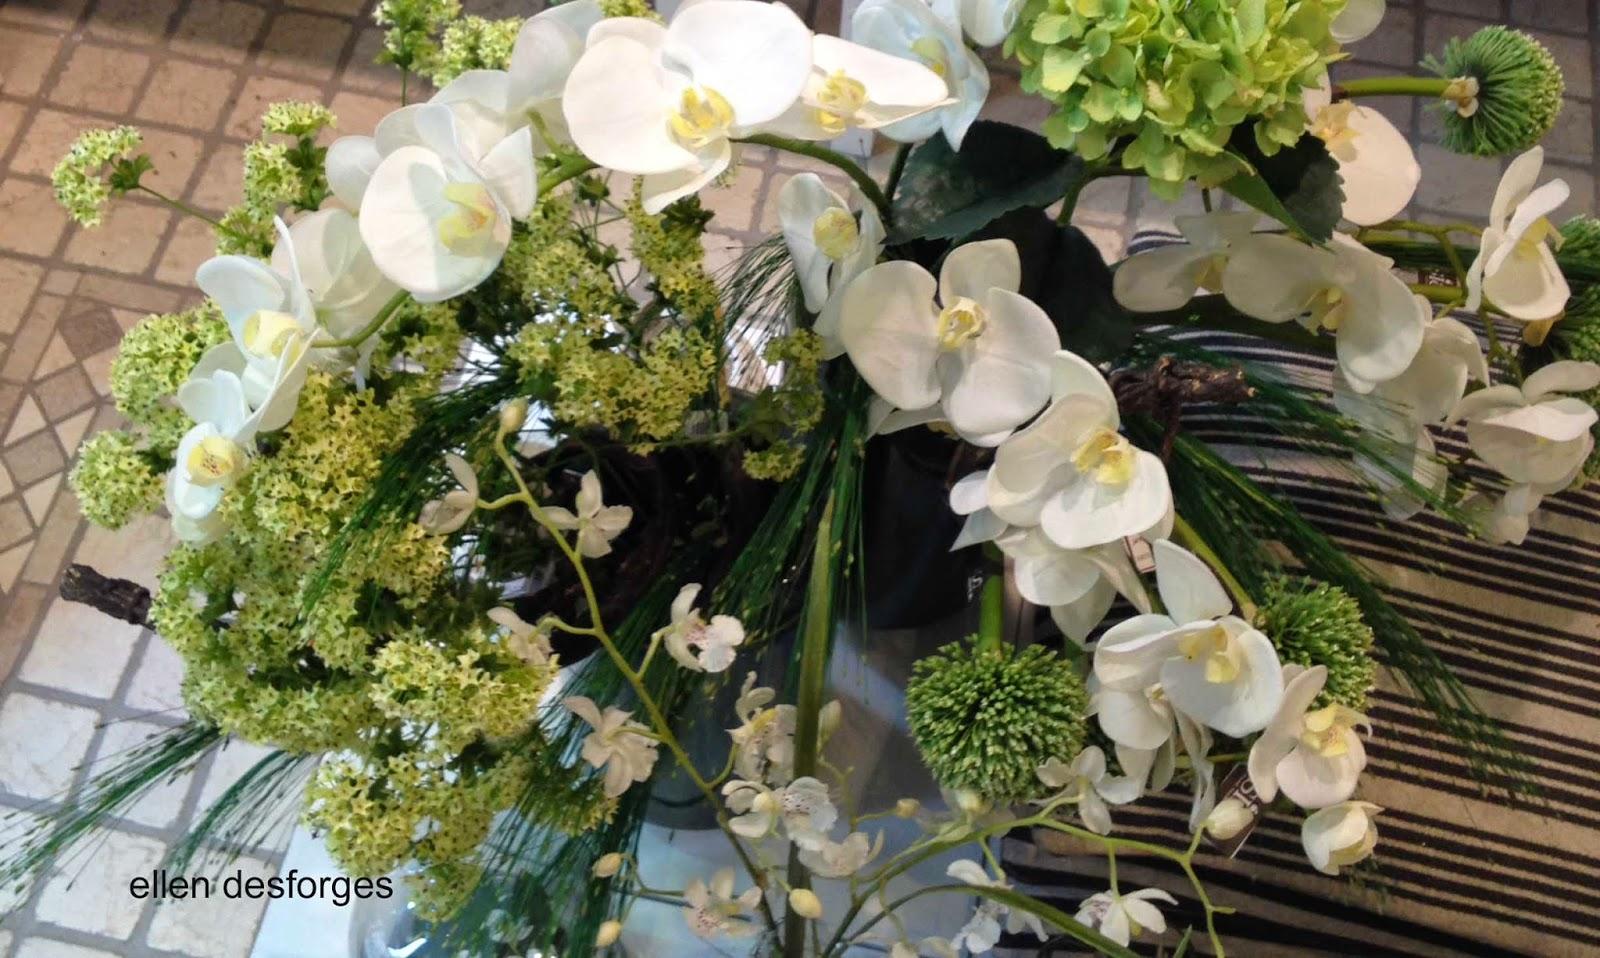 ellen desforges orchid es la tige ou en pot les. Black Bedroom Furniture Sets. Home Design Ideas